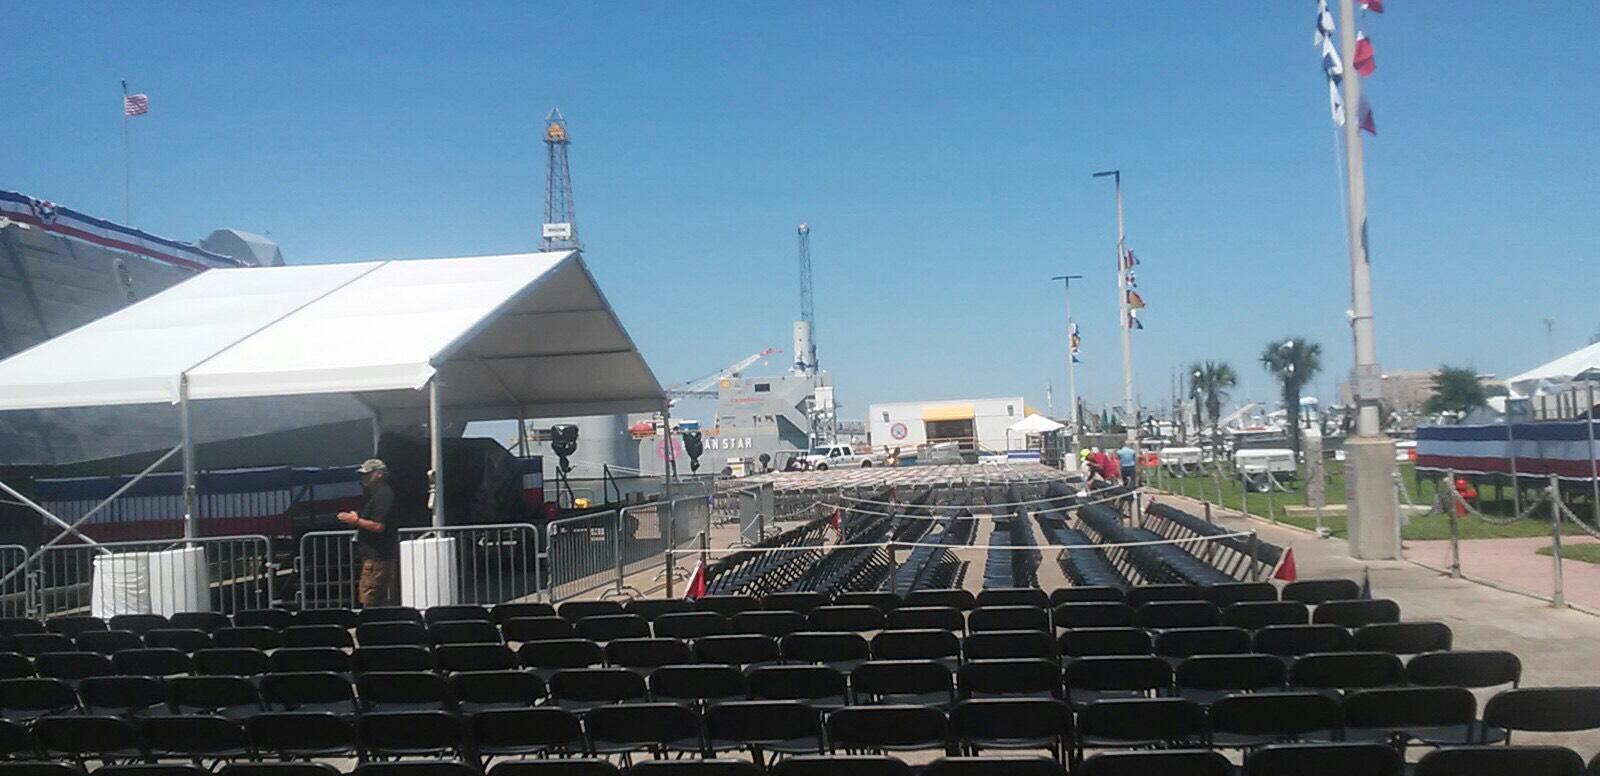 Stage & Floor Rental   Peerless Events and Tents